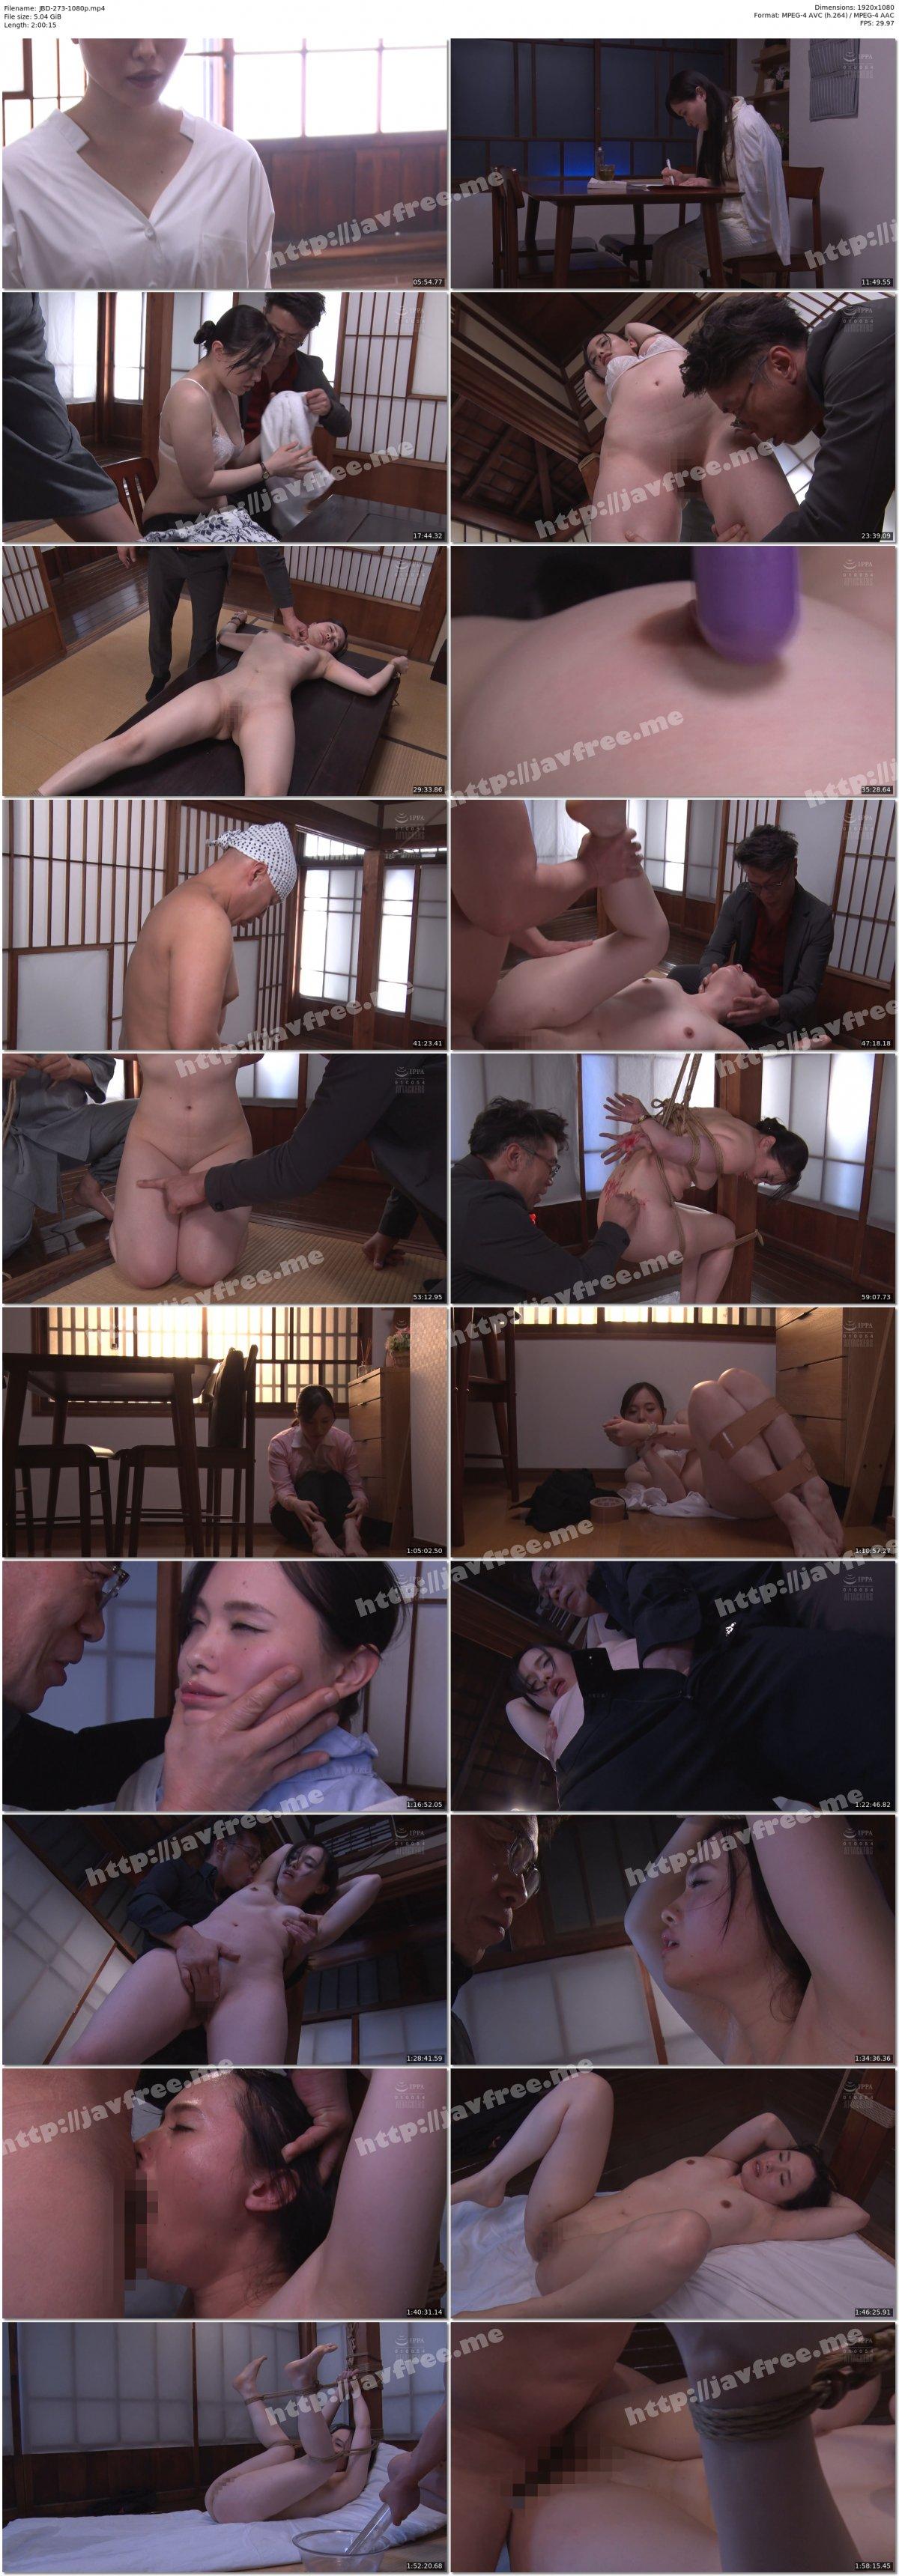 [HD][JBD-273] 美人女医 被虐の訪問診療 前嶋美樹 - image JBD-273-1080p on https://javfree.me